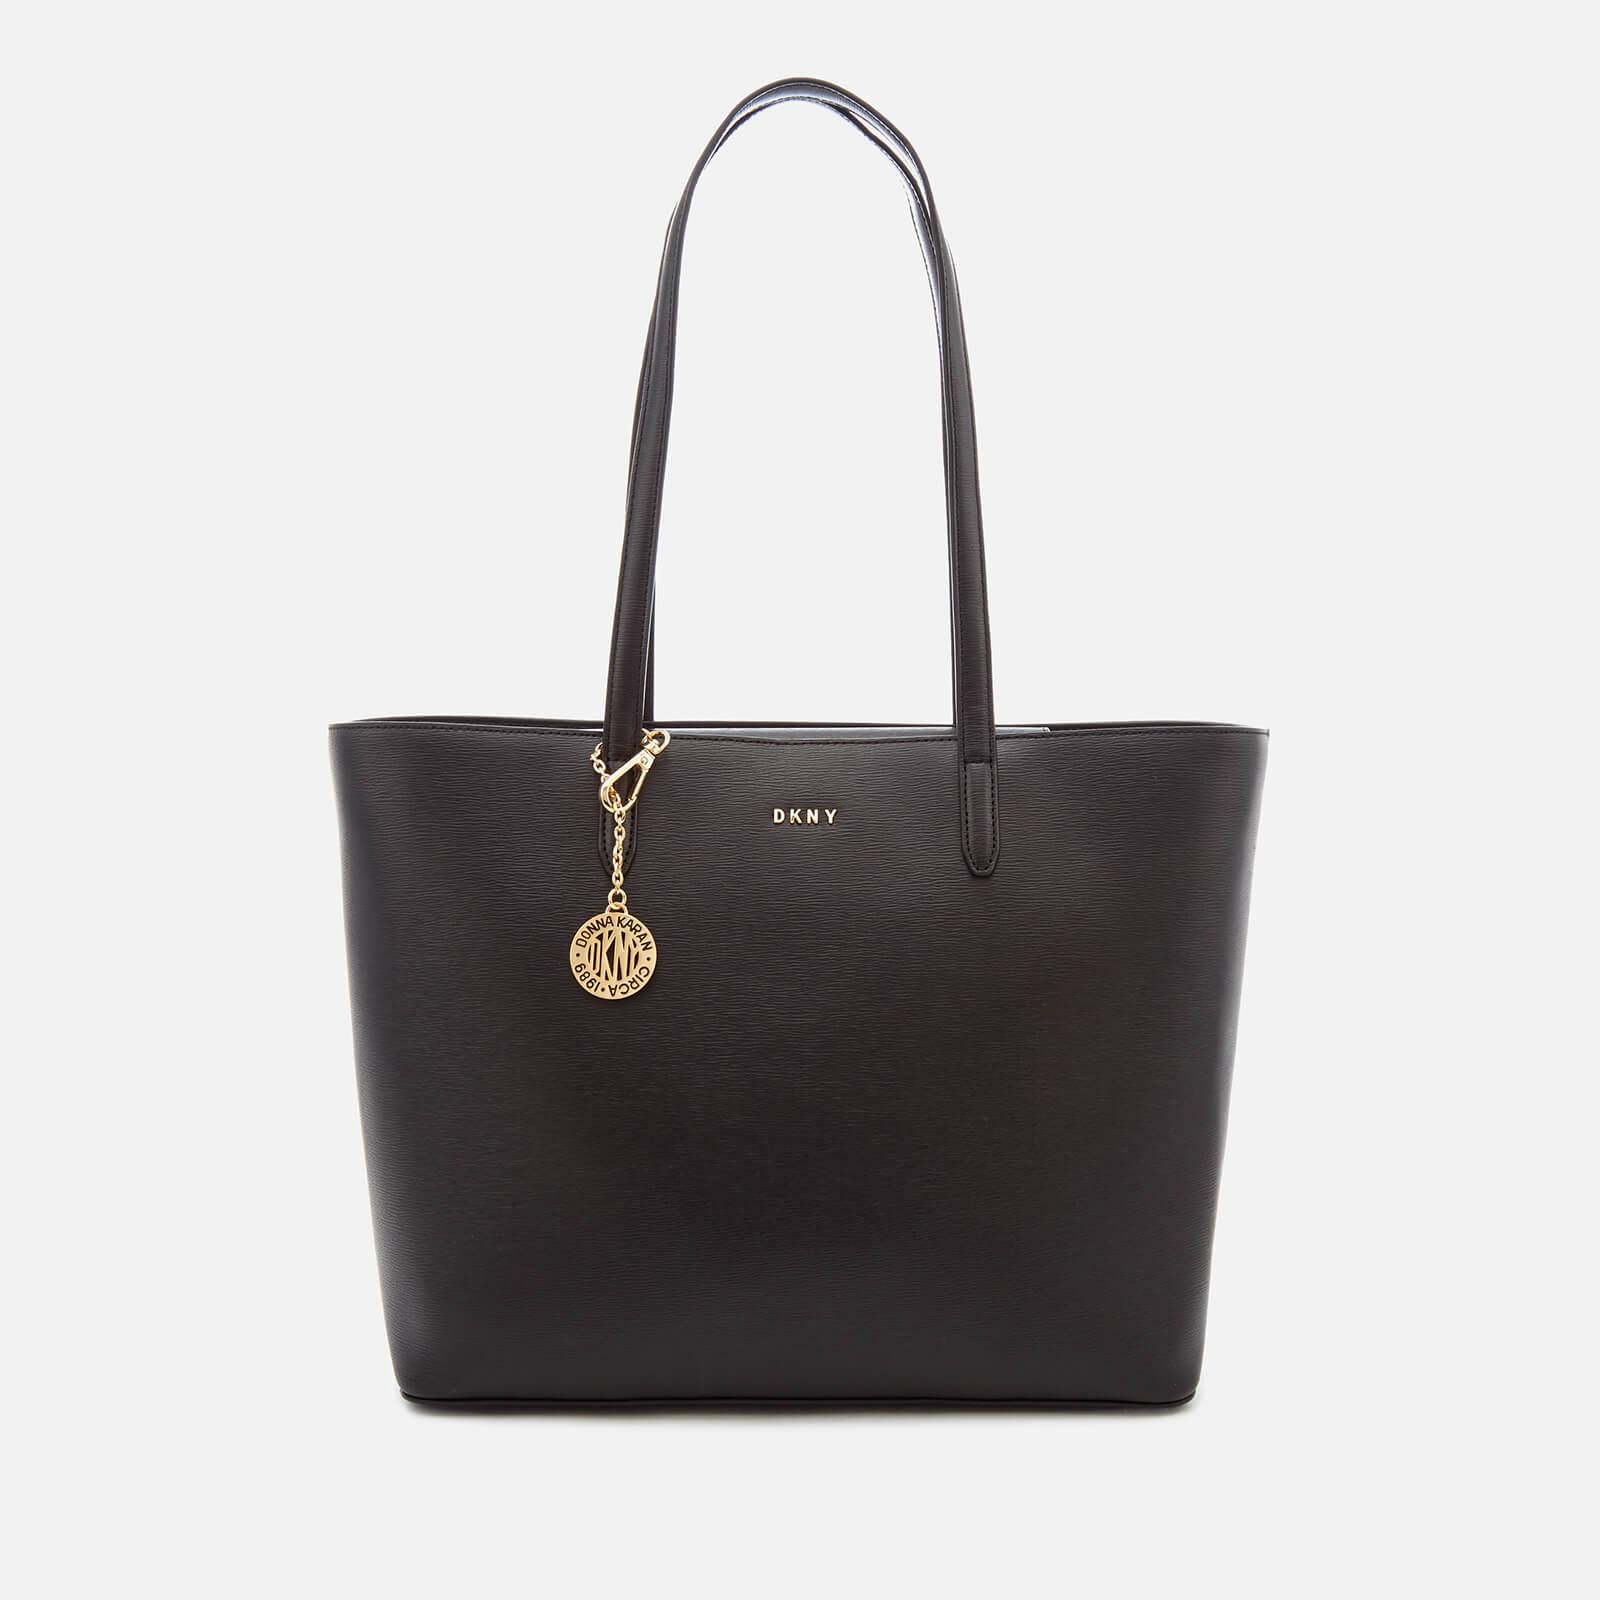 DKNY Women's Bryant Large Tote Bag - Black